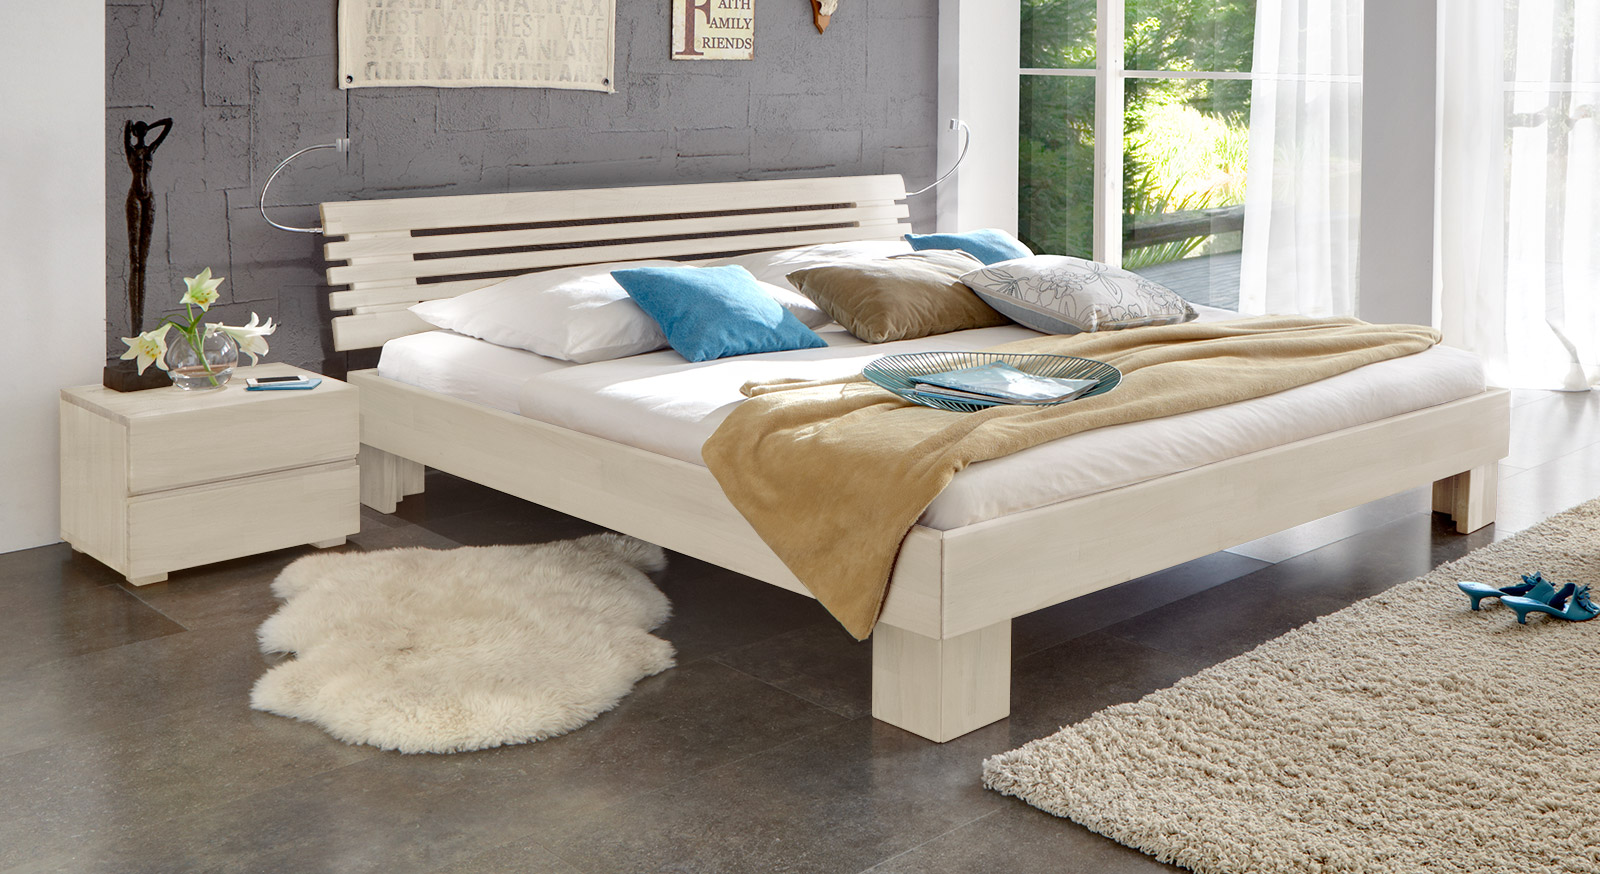 Rustikale Betten Im Landhausstil Hier Kaufen Betten De